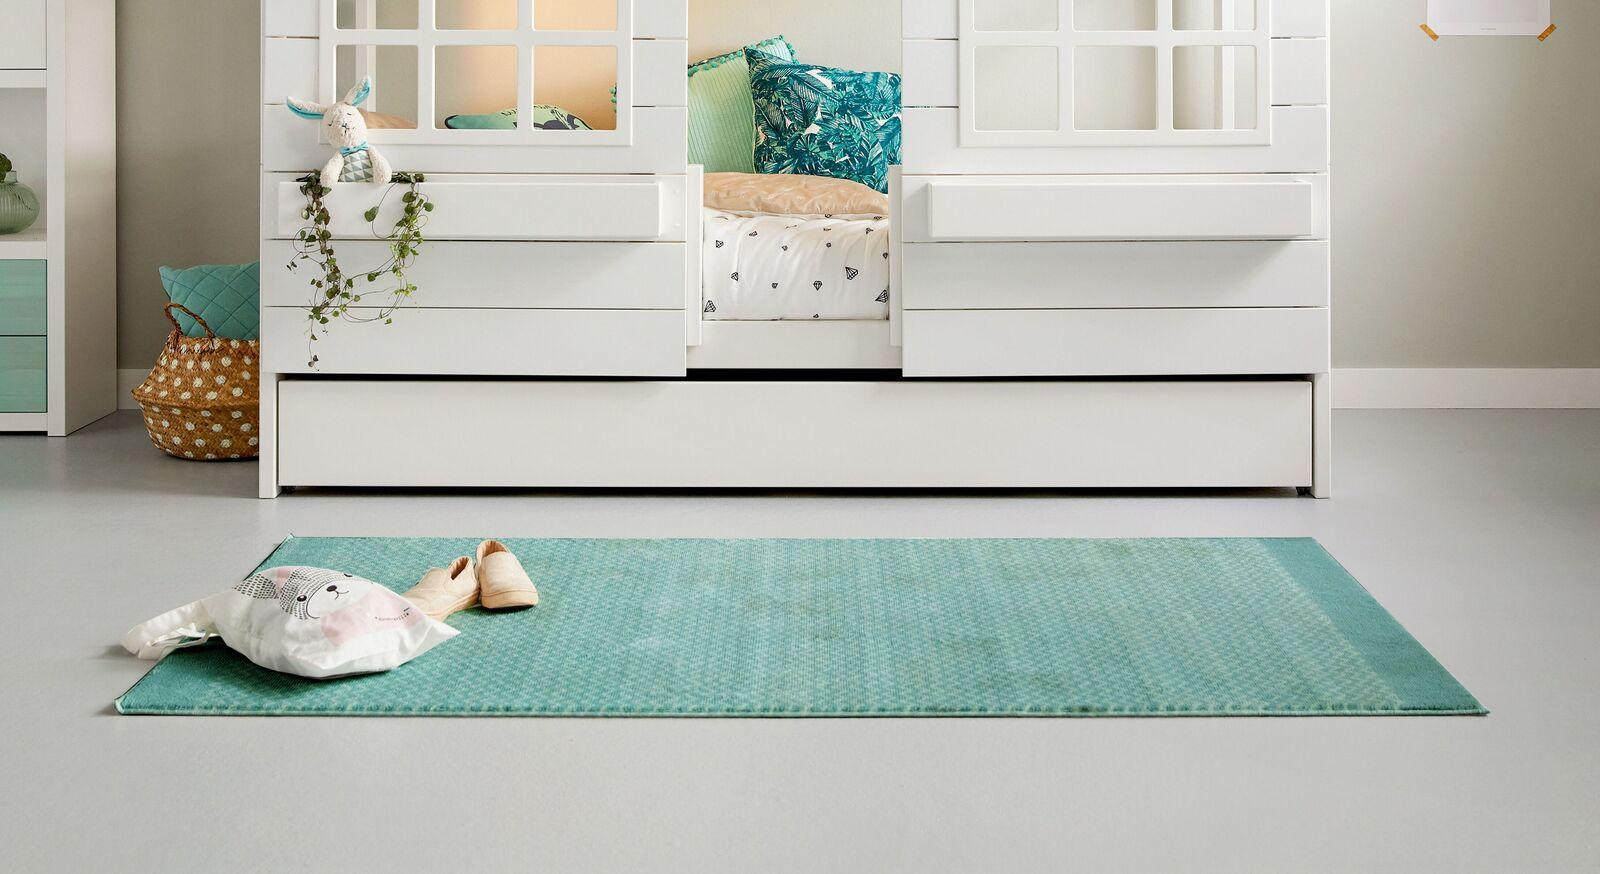 LIFETIME Teppich ZigZag in 100x180cm